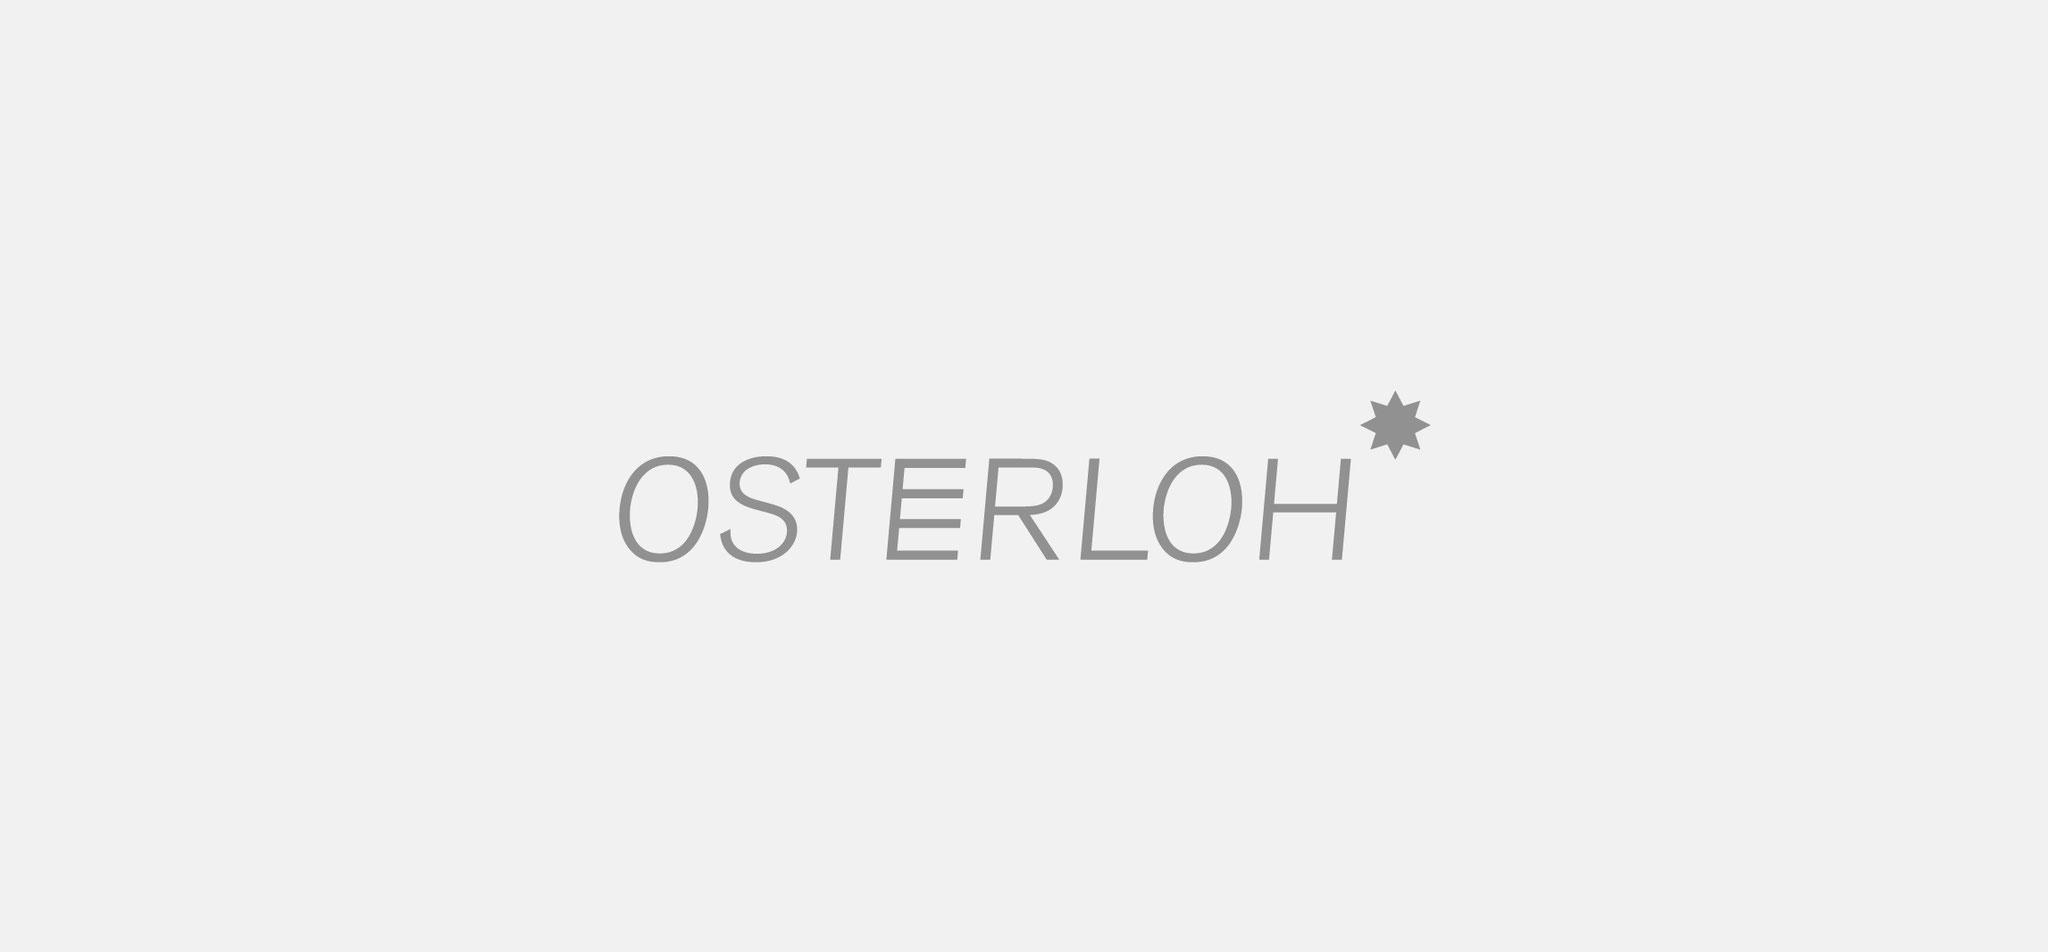 OSTERLOH | logo osterloh – infragrau, gute gestaltung